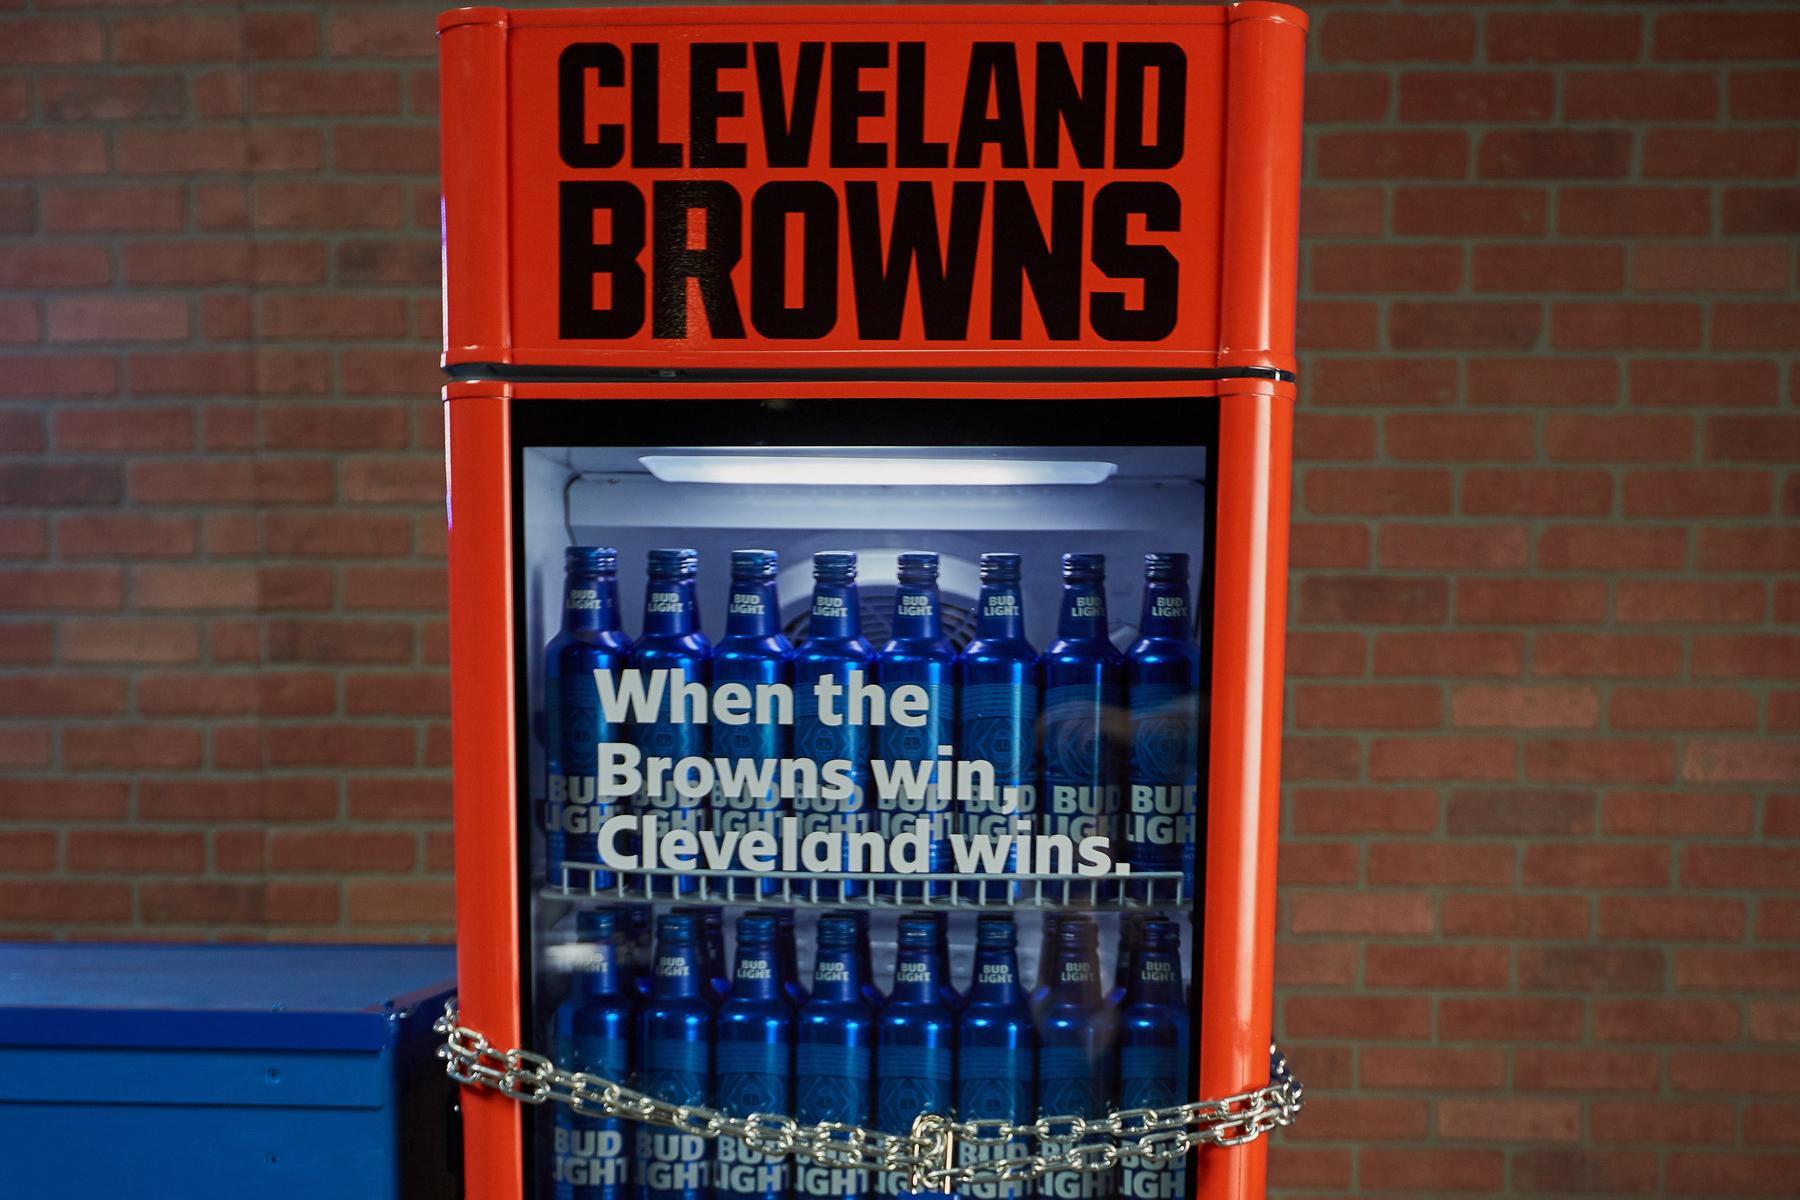 Bud Light Cleveland Browns Victory Fridge